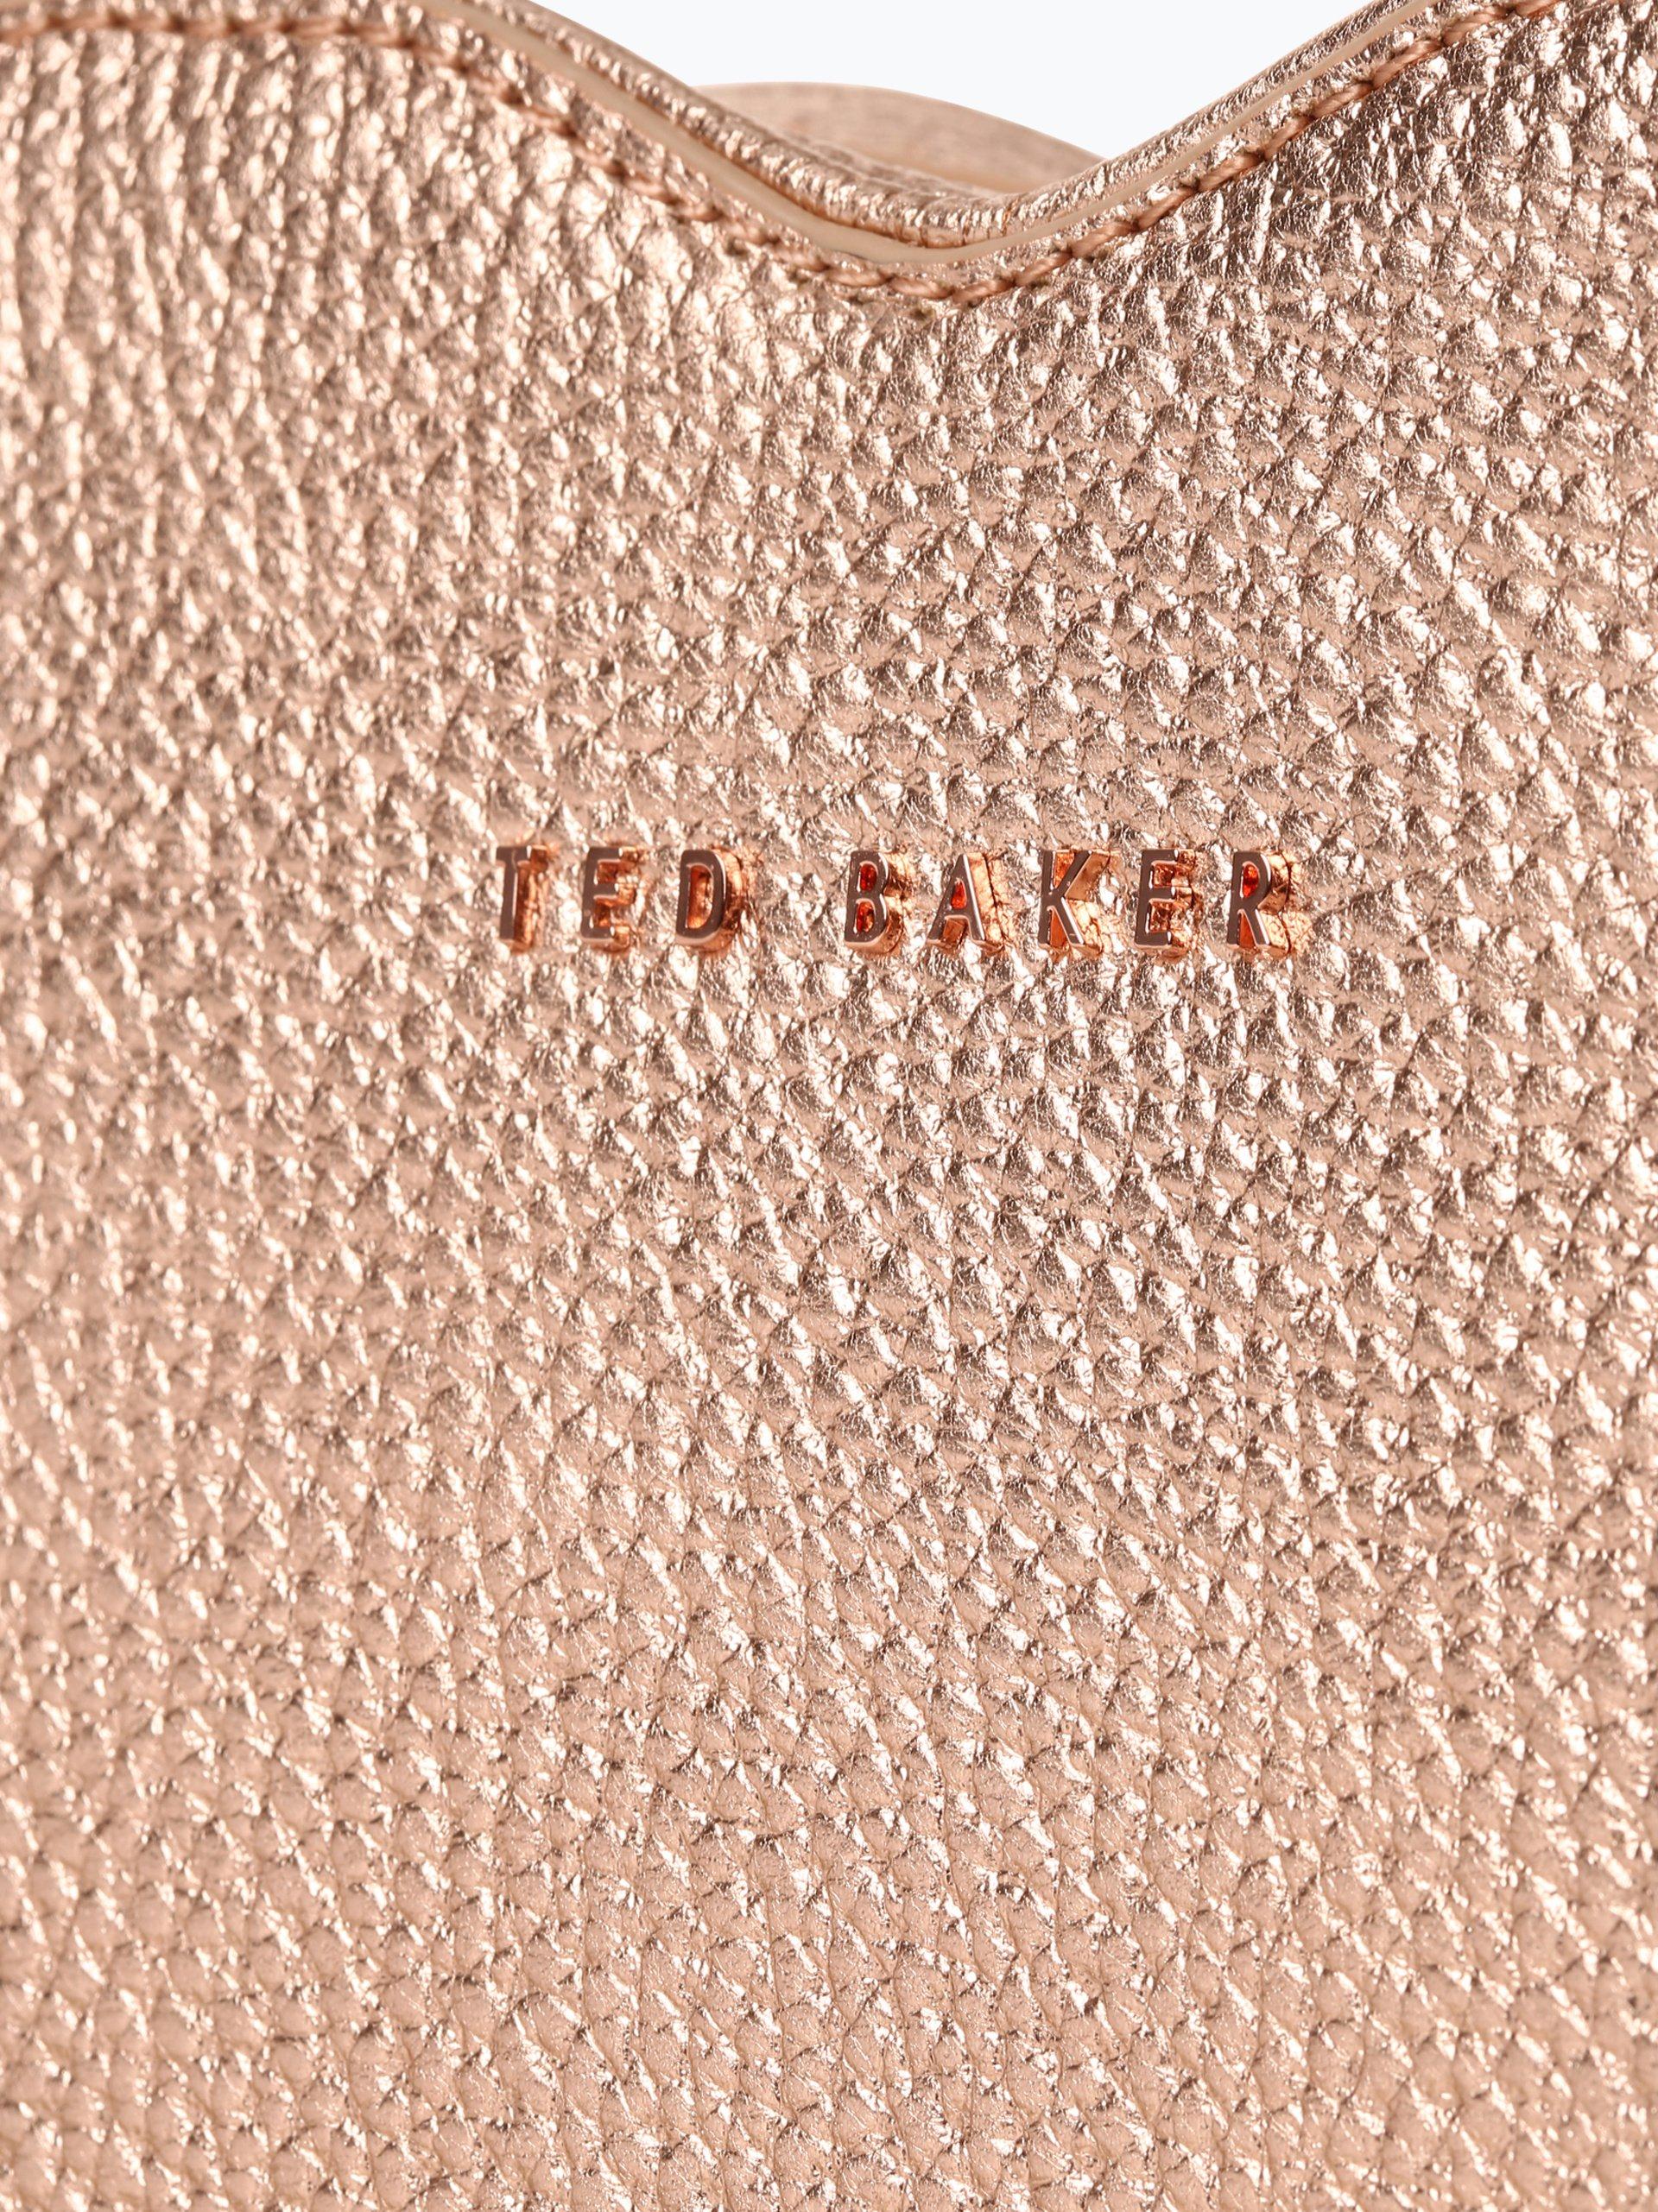 Ted Baker Damen Umhängetasche aus Leder - Amellie